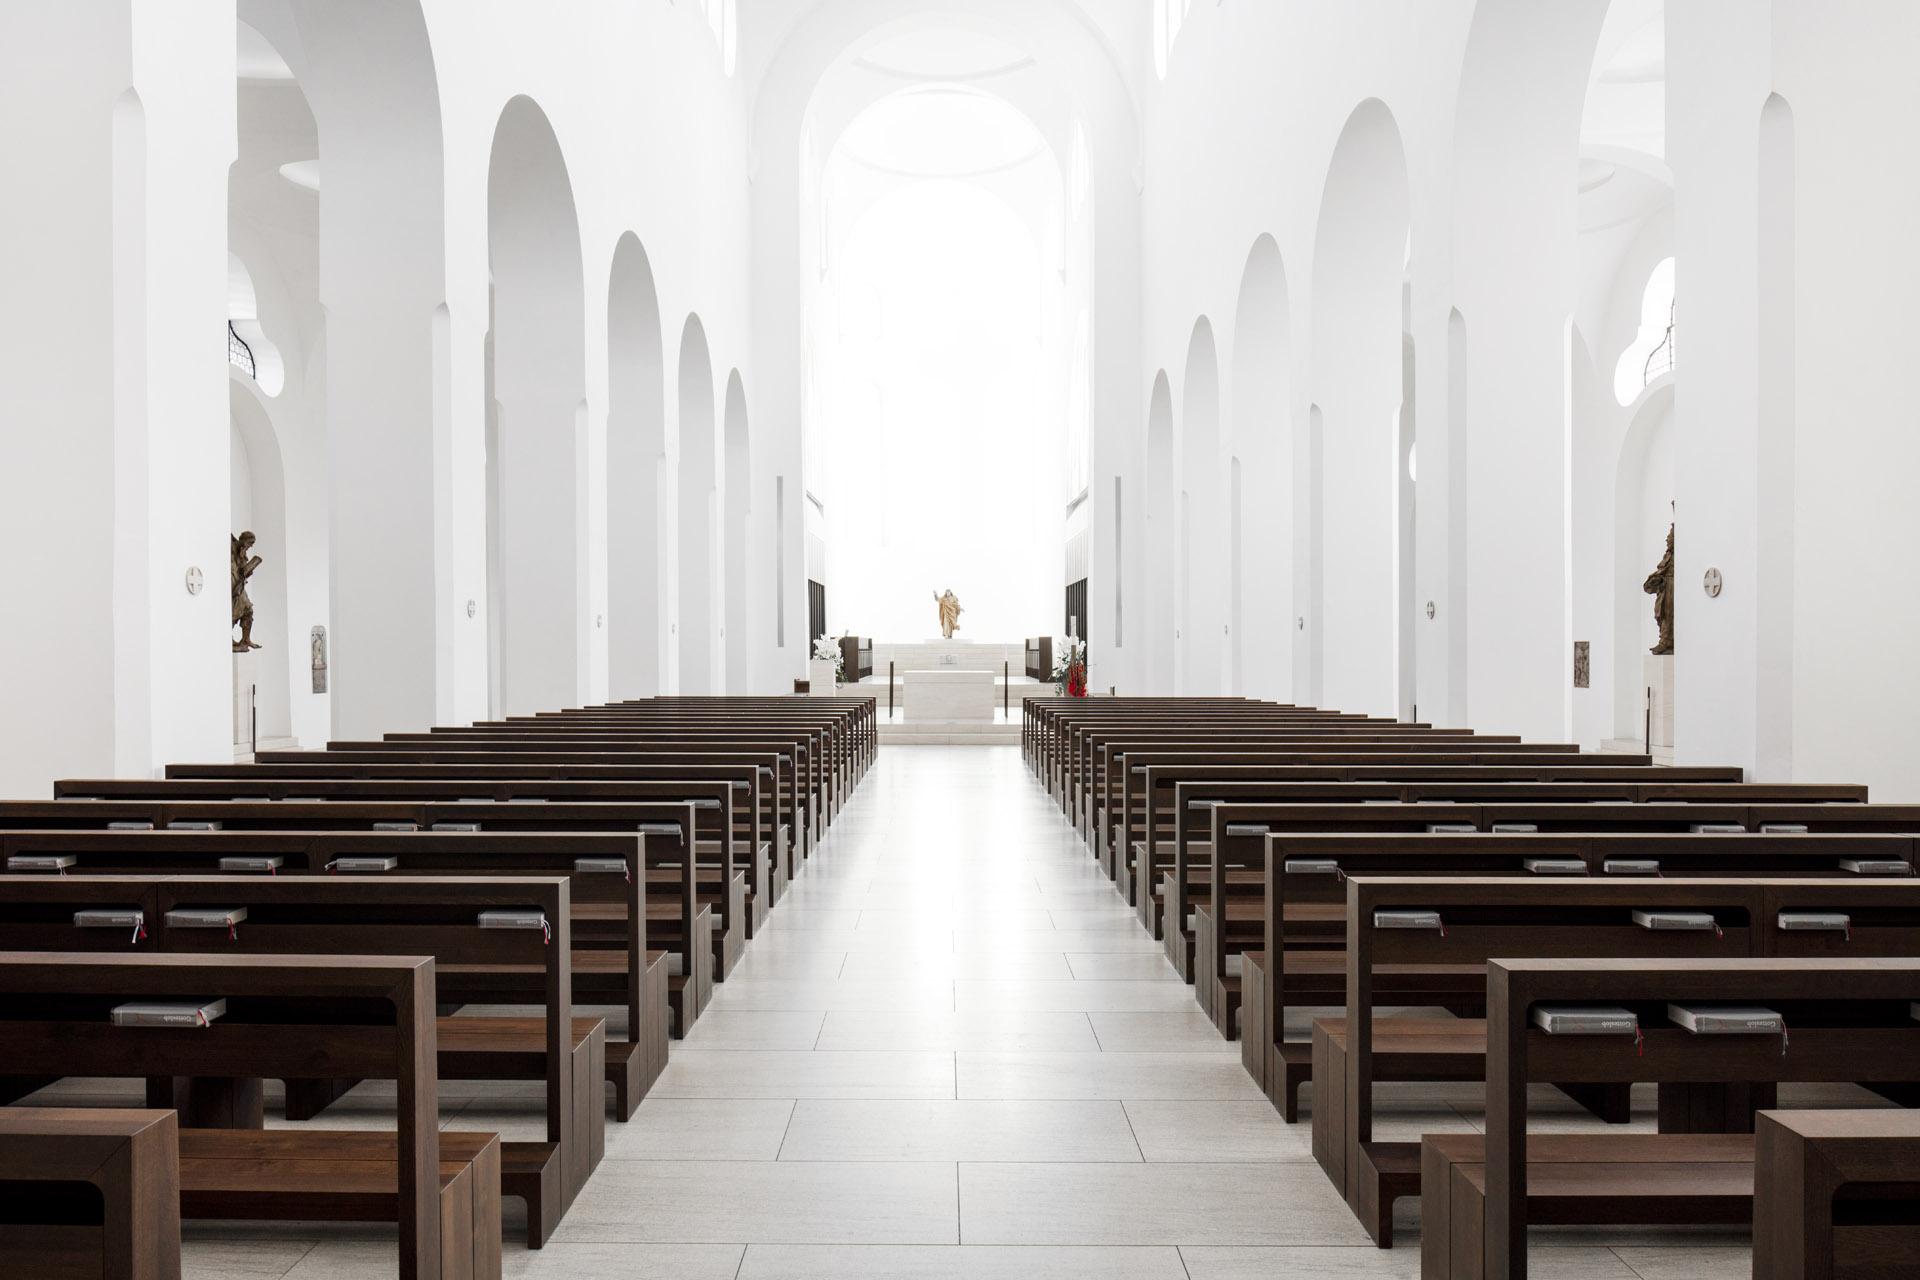 A9A3126 - Moritzkirche